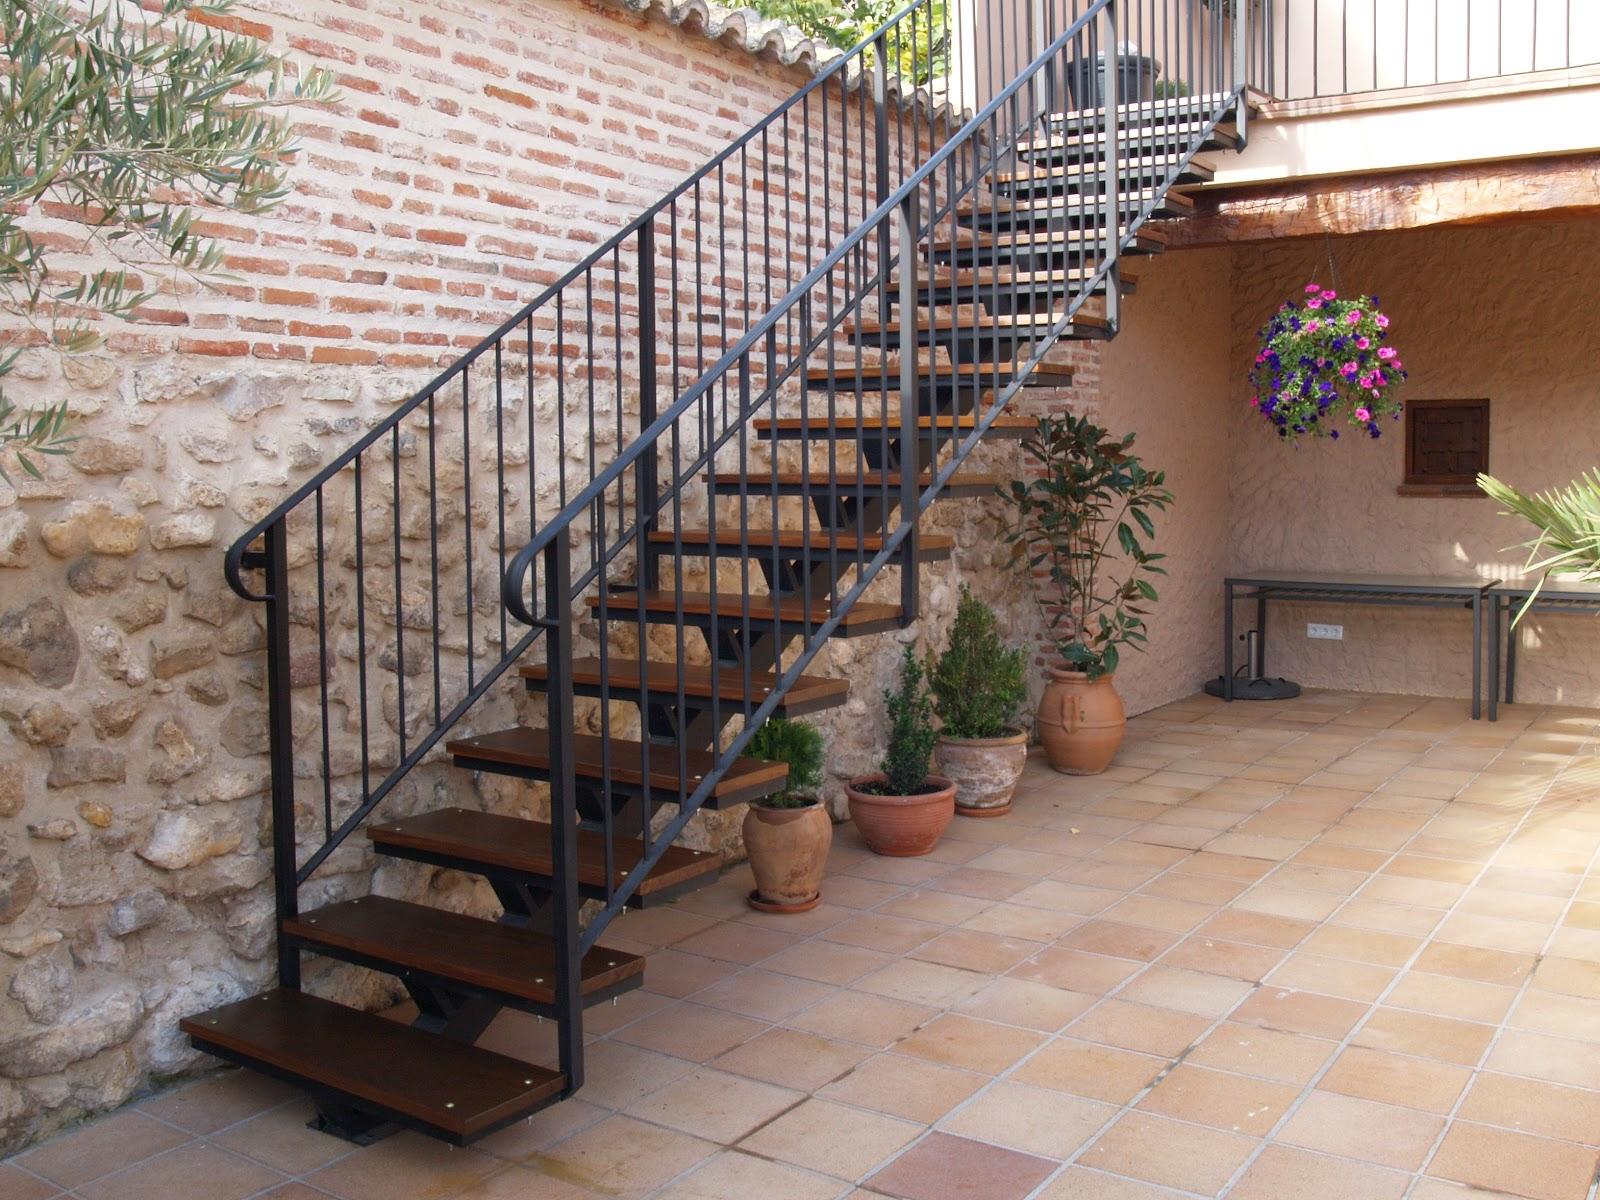 Trabajos lmb escalera exterior - Escaleras de exterior ...